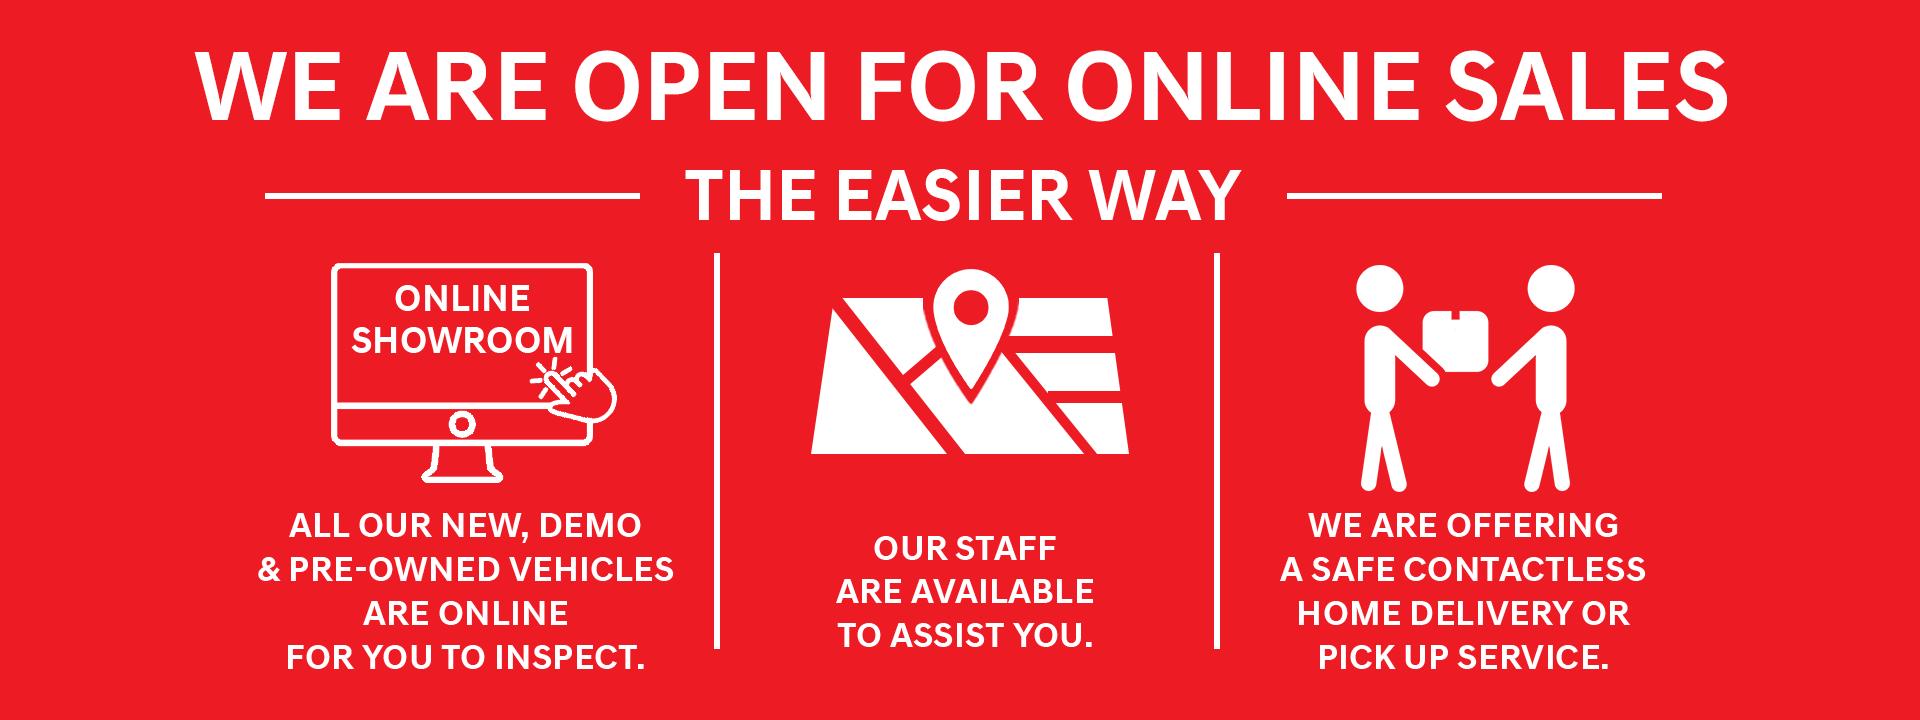 Dandenong Hyundai - We are open online